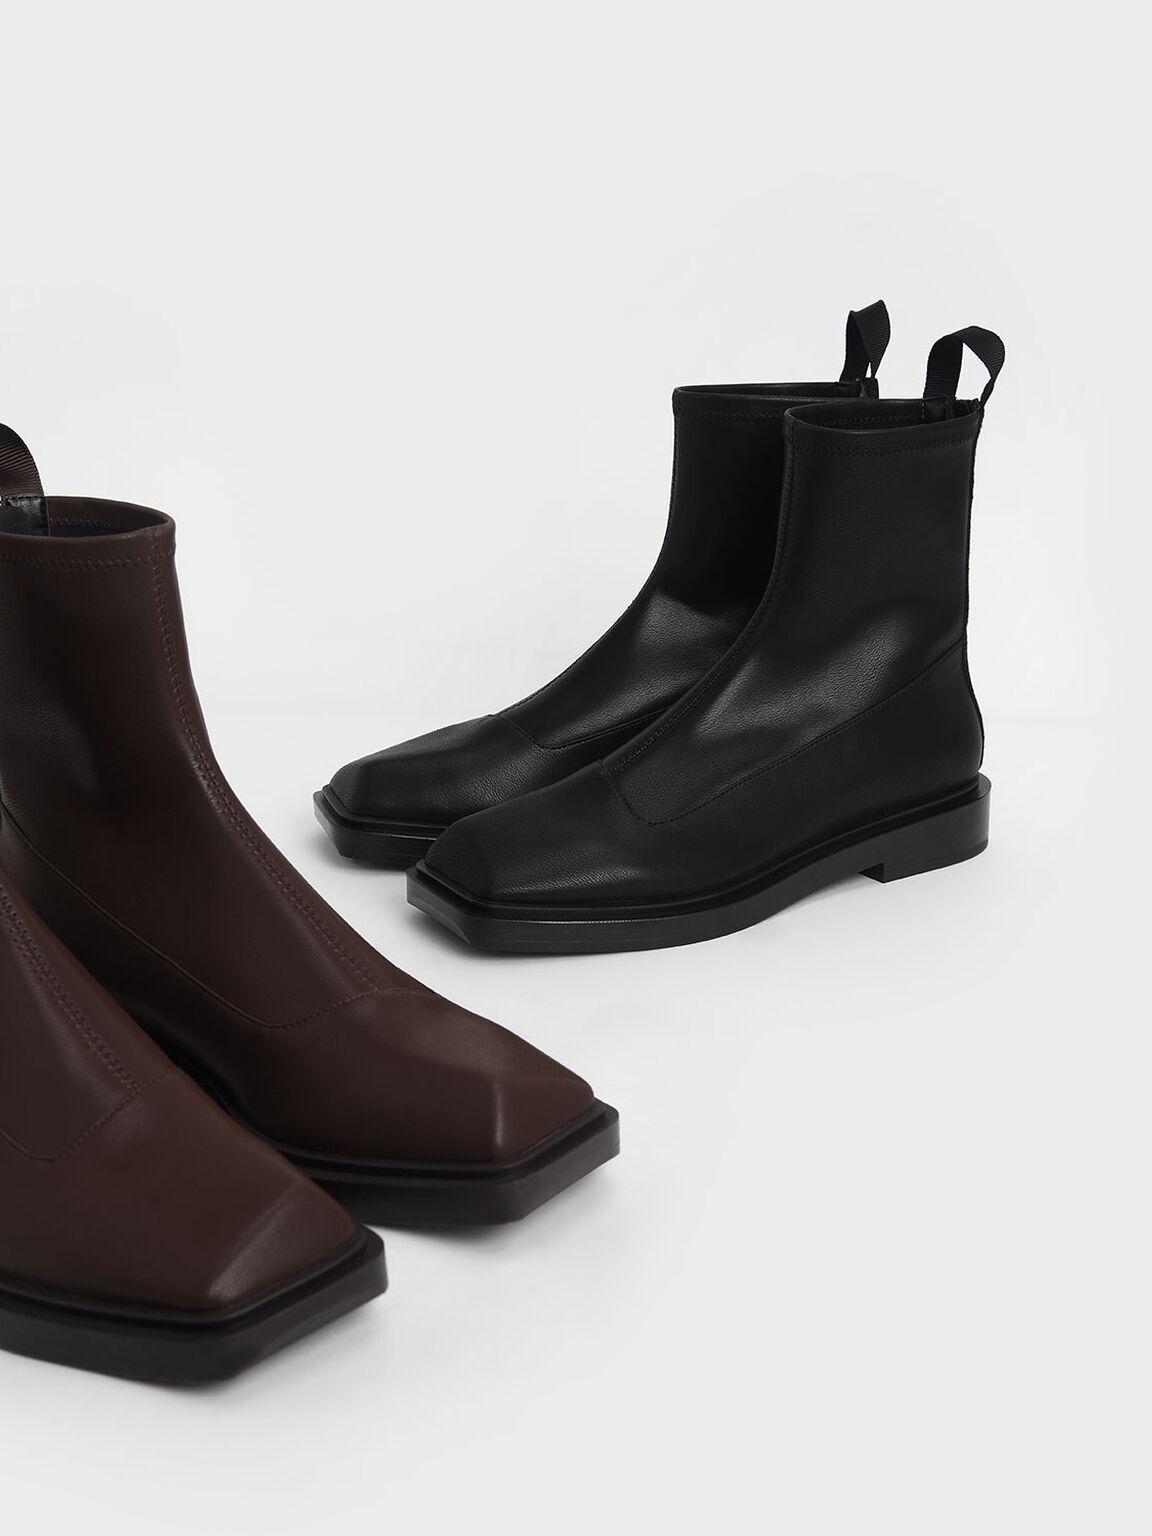 Sculptural Ankle Boots, Dark Brown, hi-res